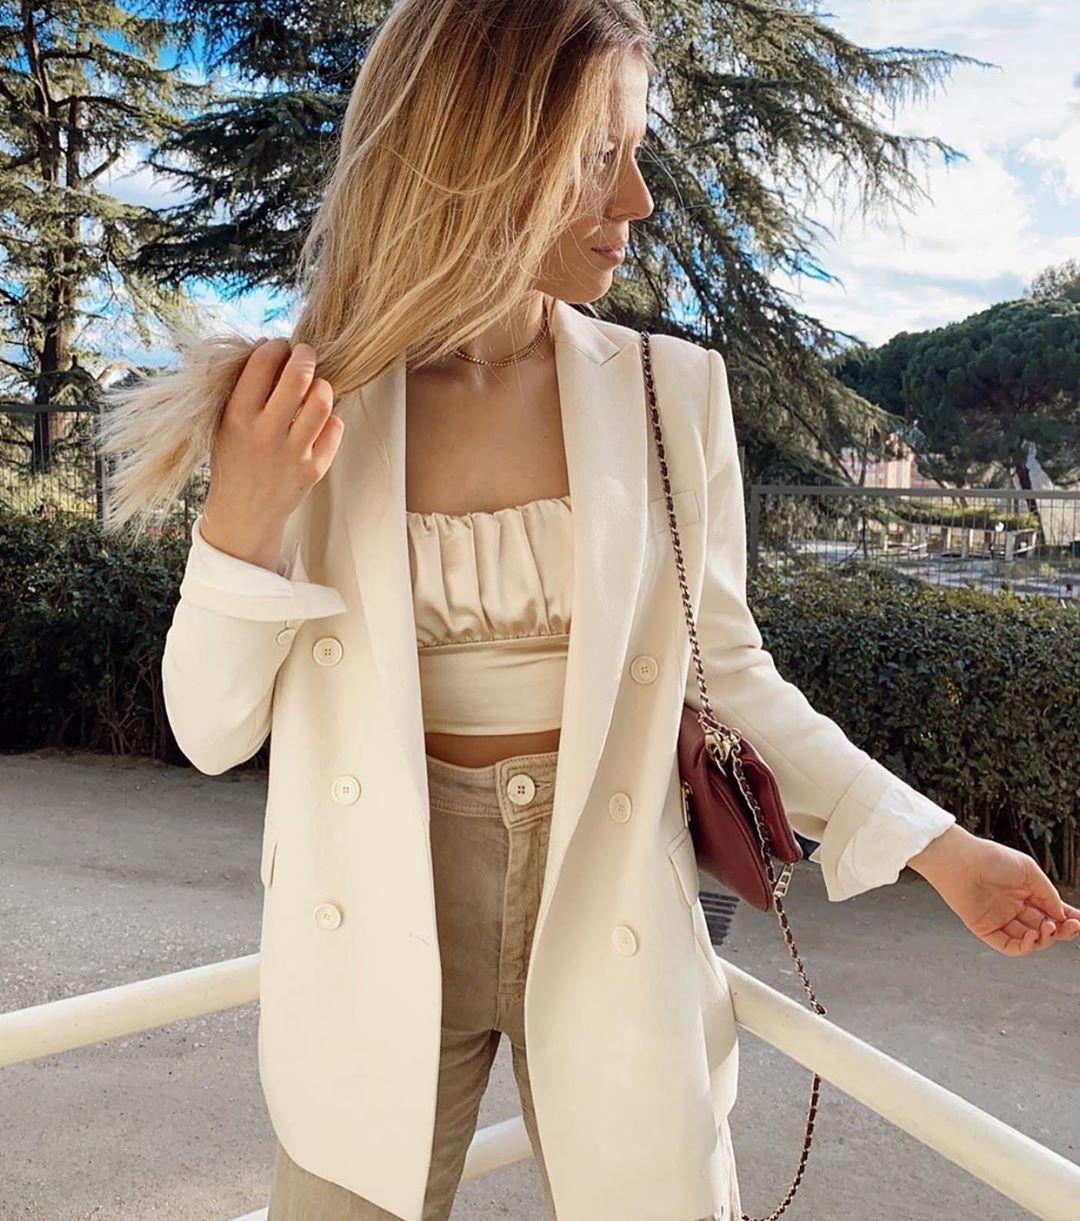 crossover breasted jacket de Zara sur zaraaddiction